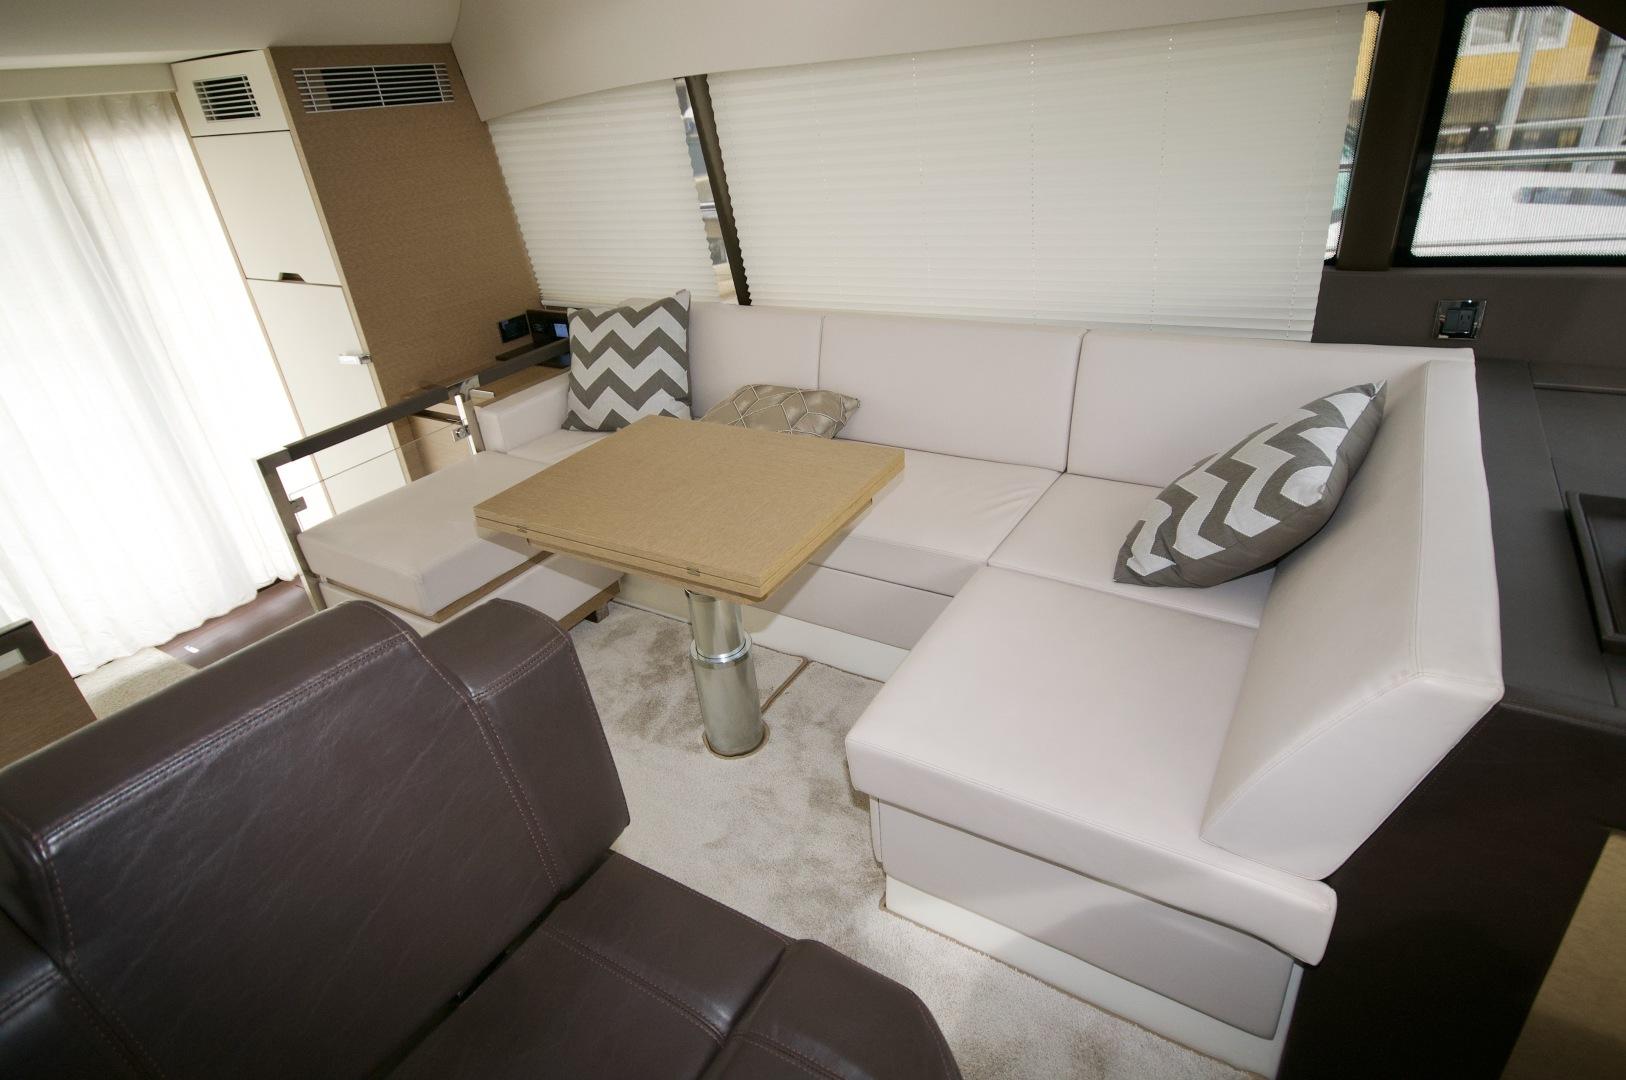 Prestige-460 S 2018-Unforgettable St Petersburg-Florida-United States-2018 Prestige 460 S Yacht  Unforgettable  Dinette-1501562   Thumbnail